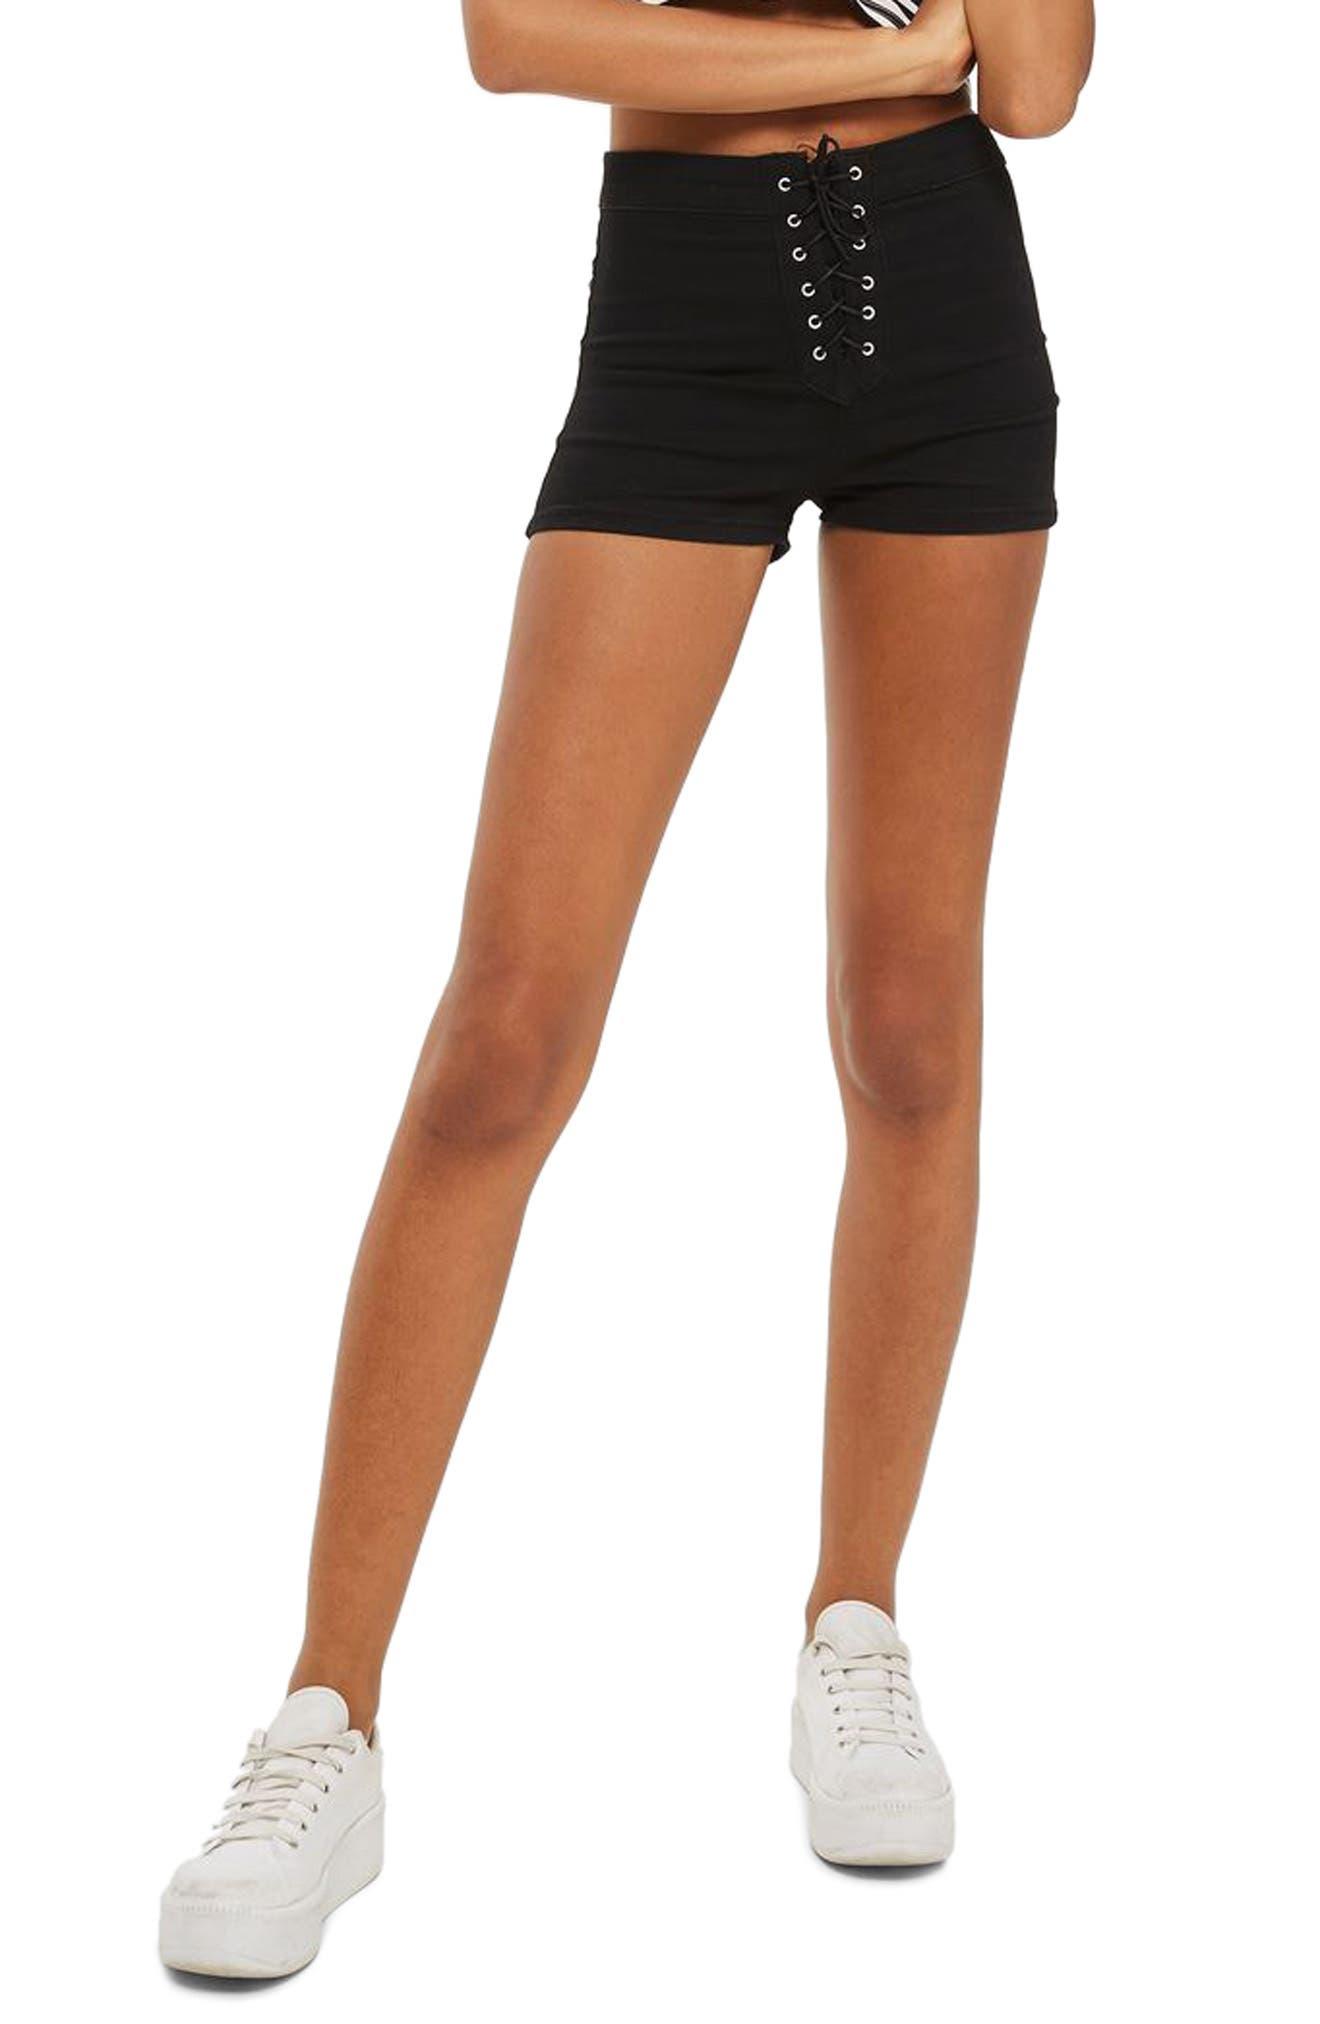 Topshop Joni Lace-Up Shorts